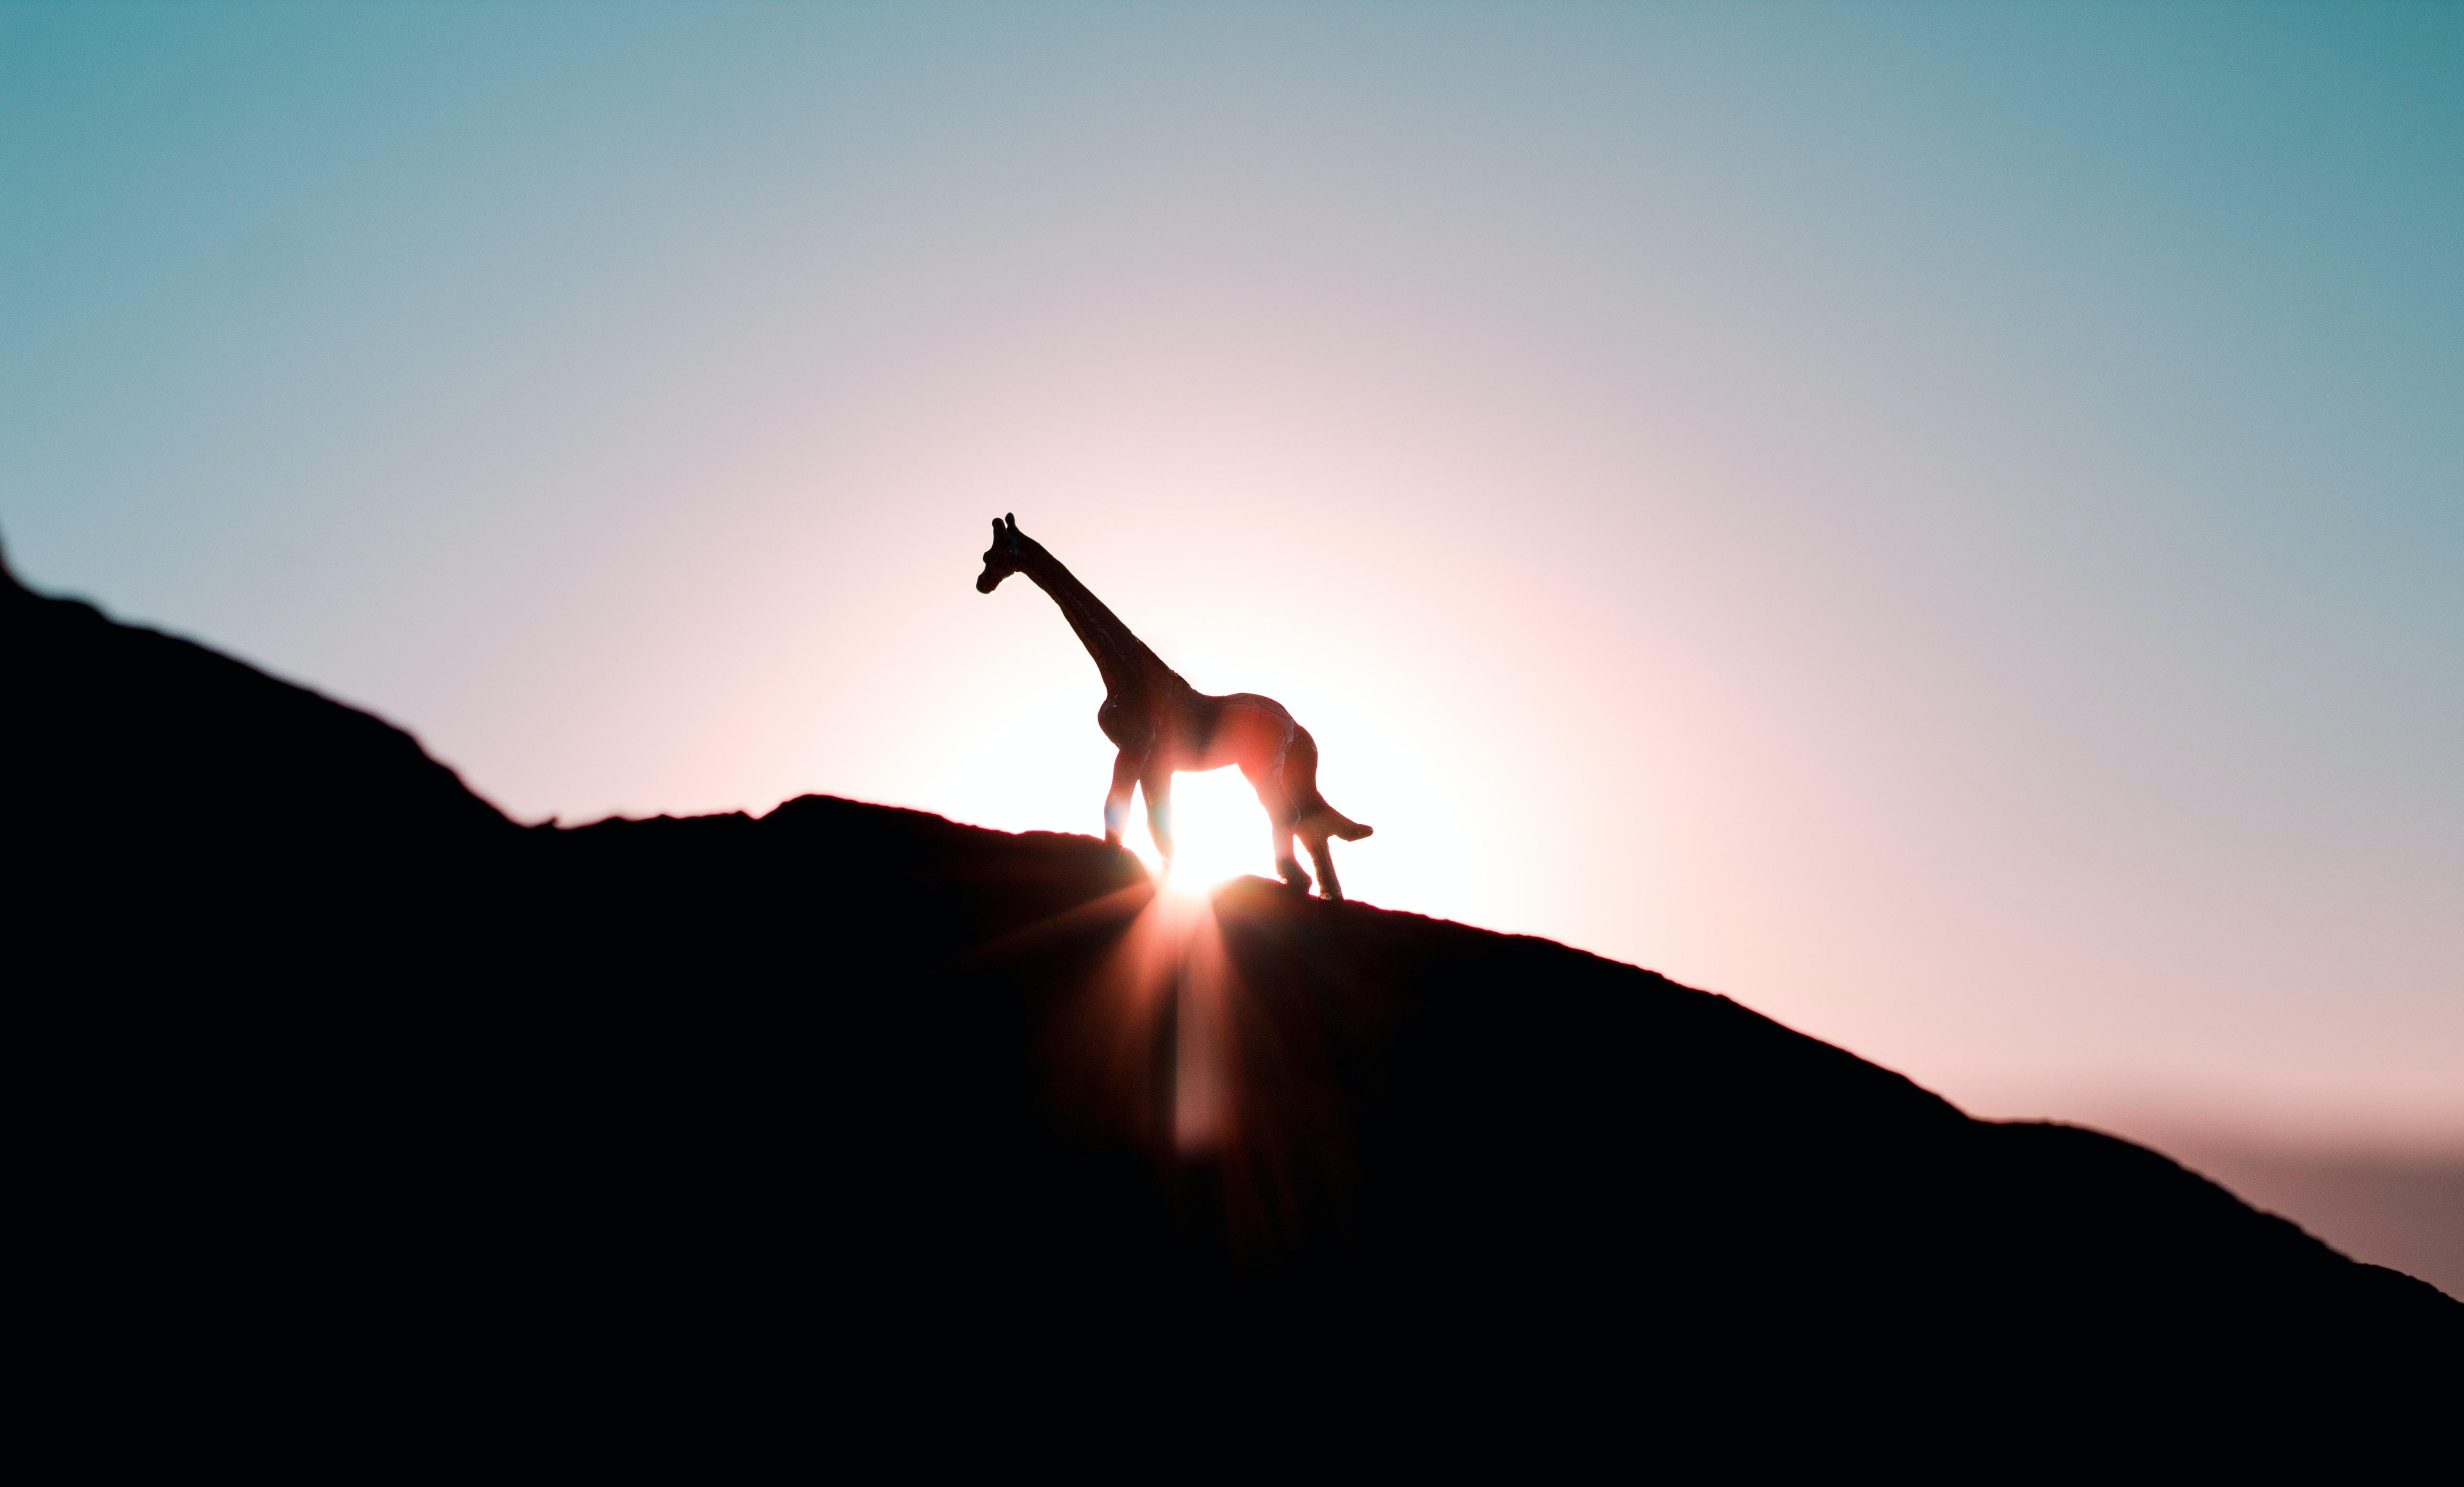 silhouette photo of giraffe during golden hour